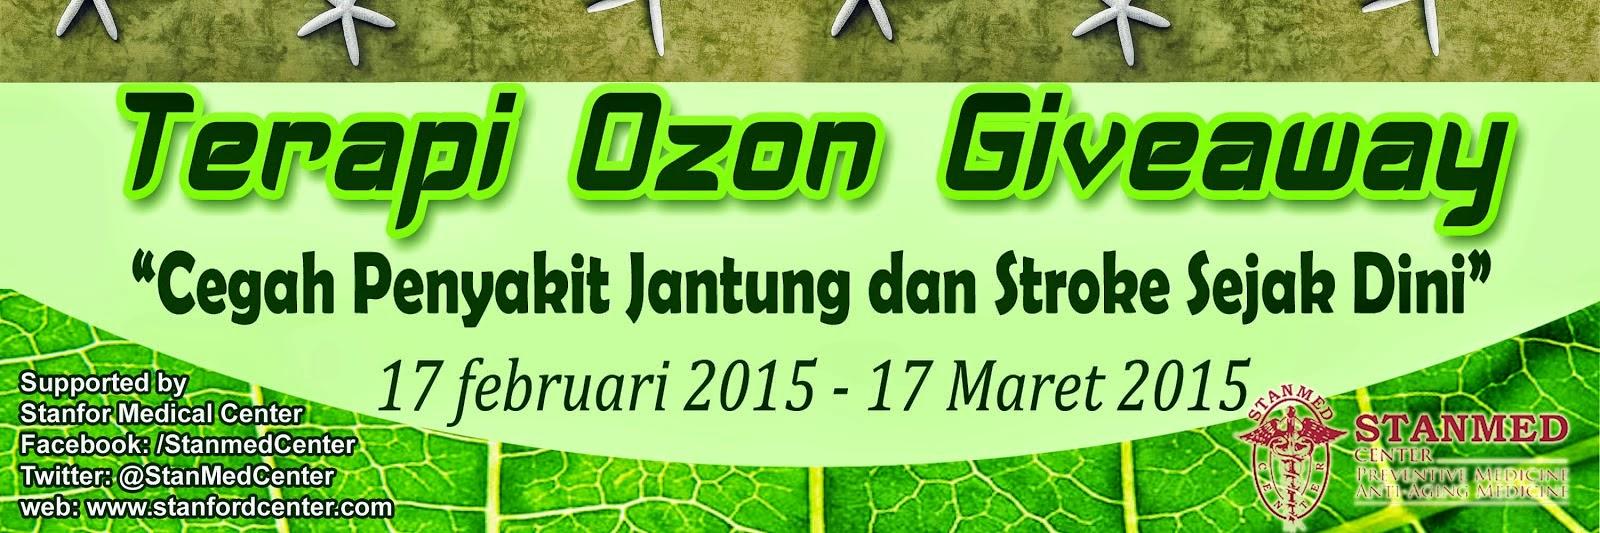 Giveaway Terapi Ozon